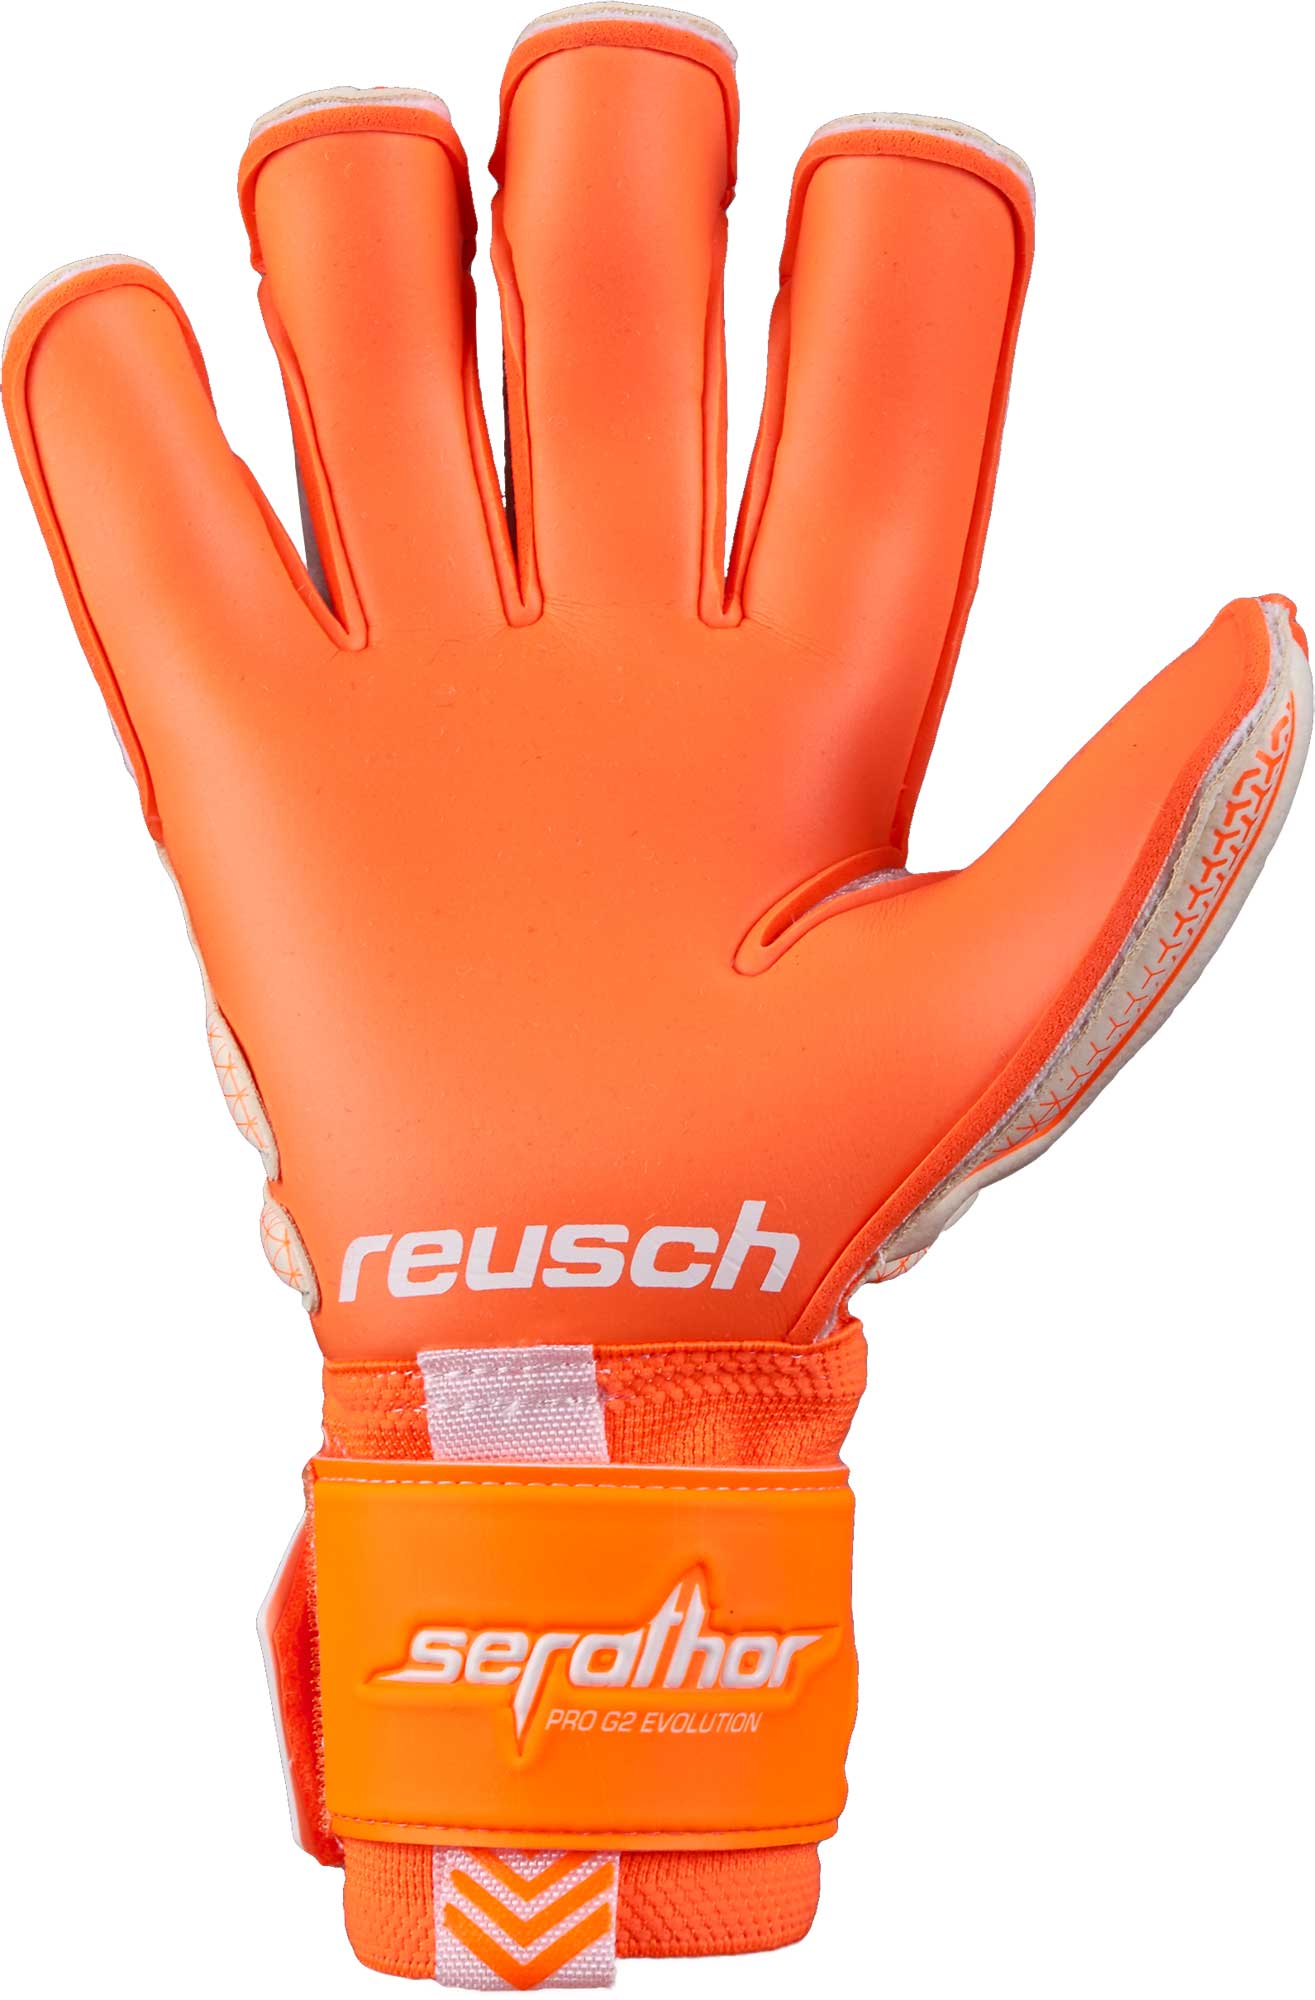 Reusch Serathor Pro G2 Evolution Cut Goalkeeper Gloves - White ... 86574e6fa2